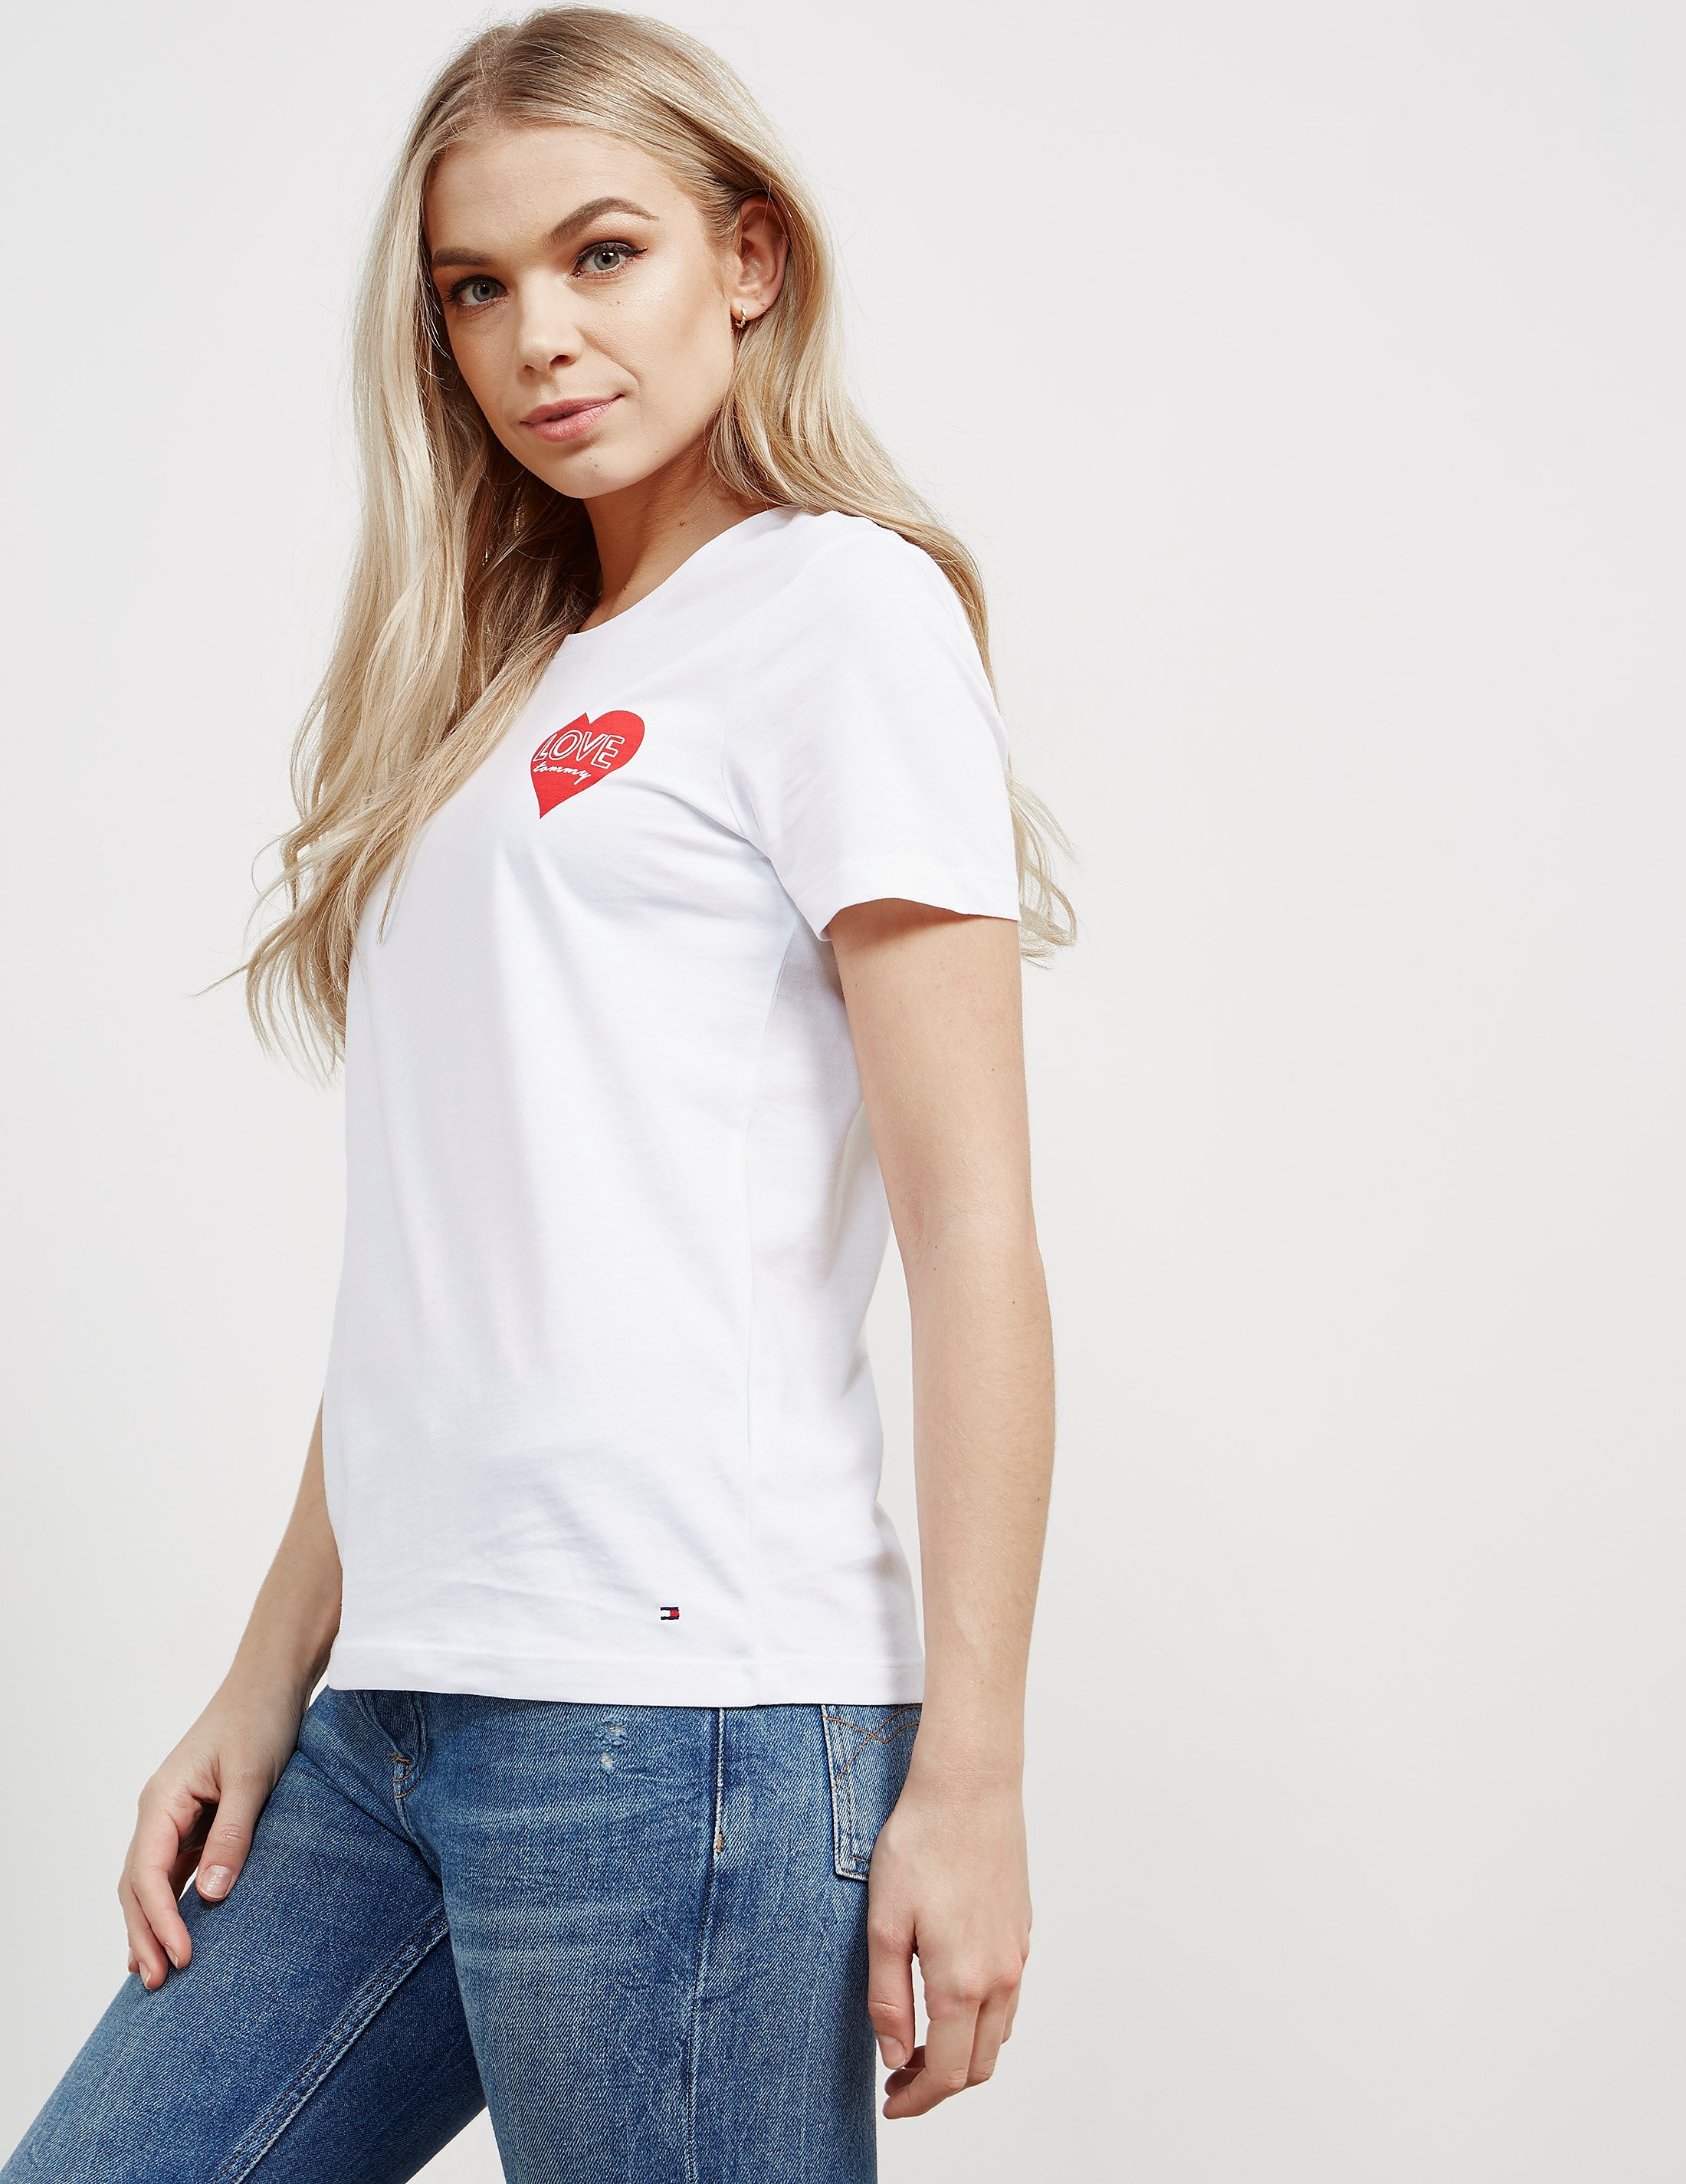 Tommy Hilfiger Small Heart Short Sleeve T-Shirt